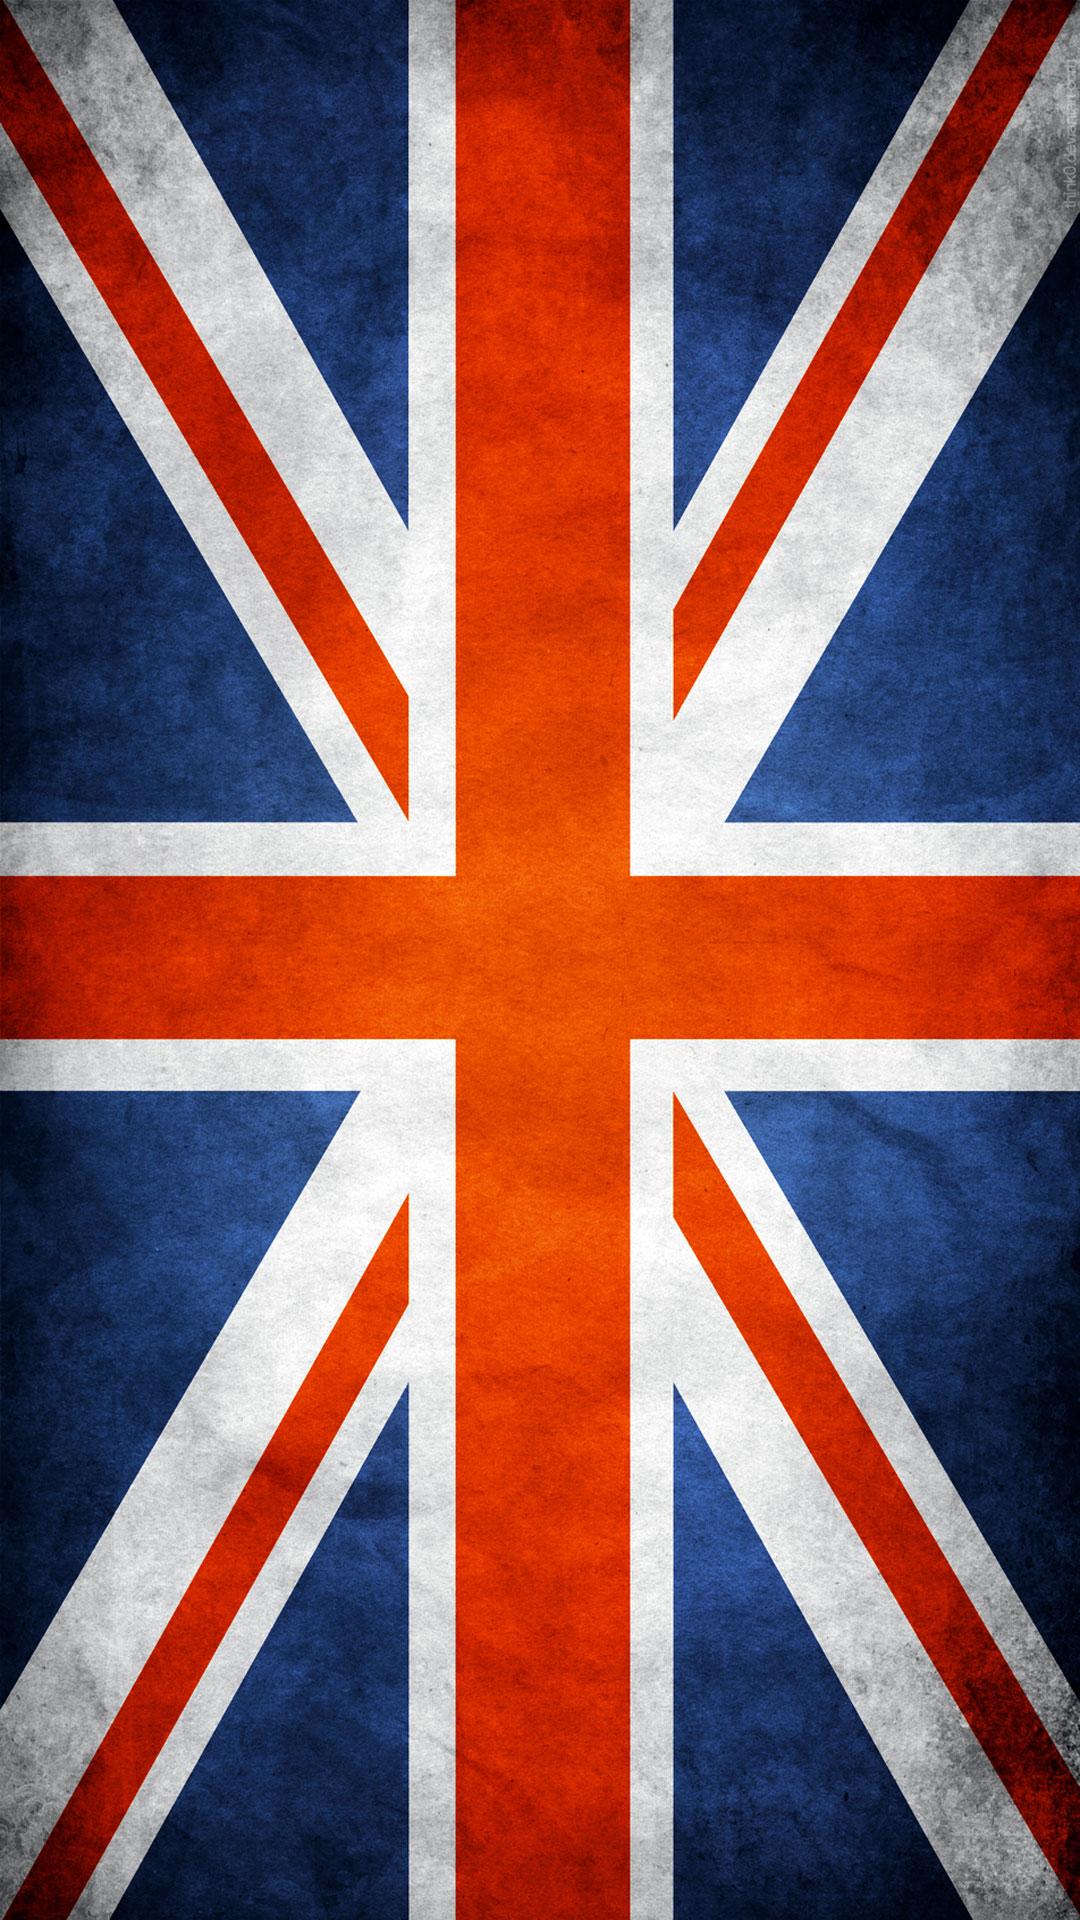 Britain UK Flag iPhone 6 Plus wallpaper 1080x1920